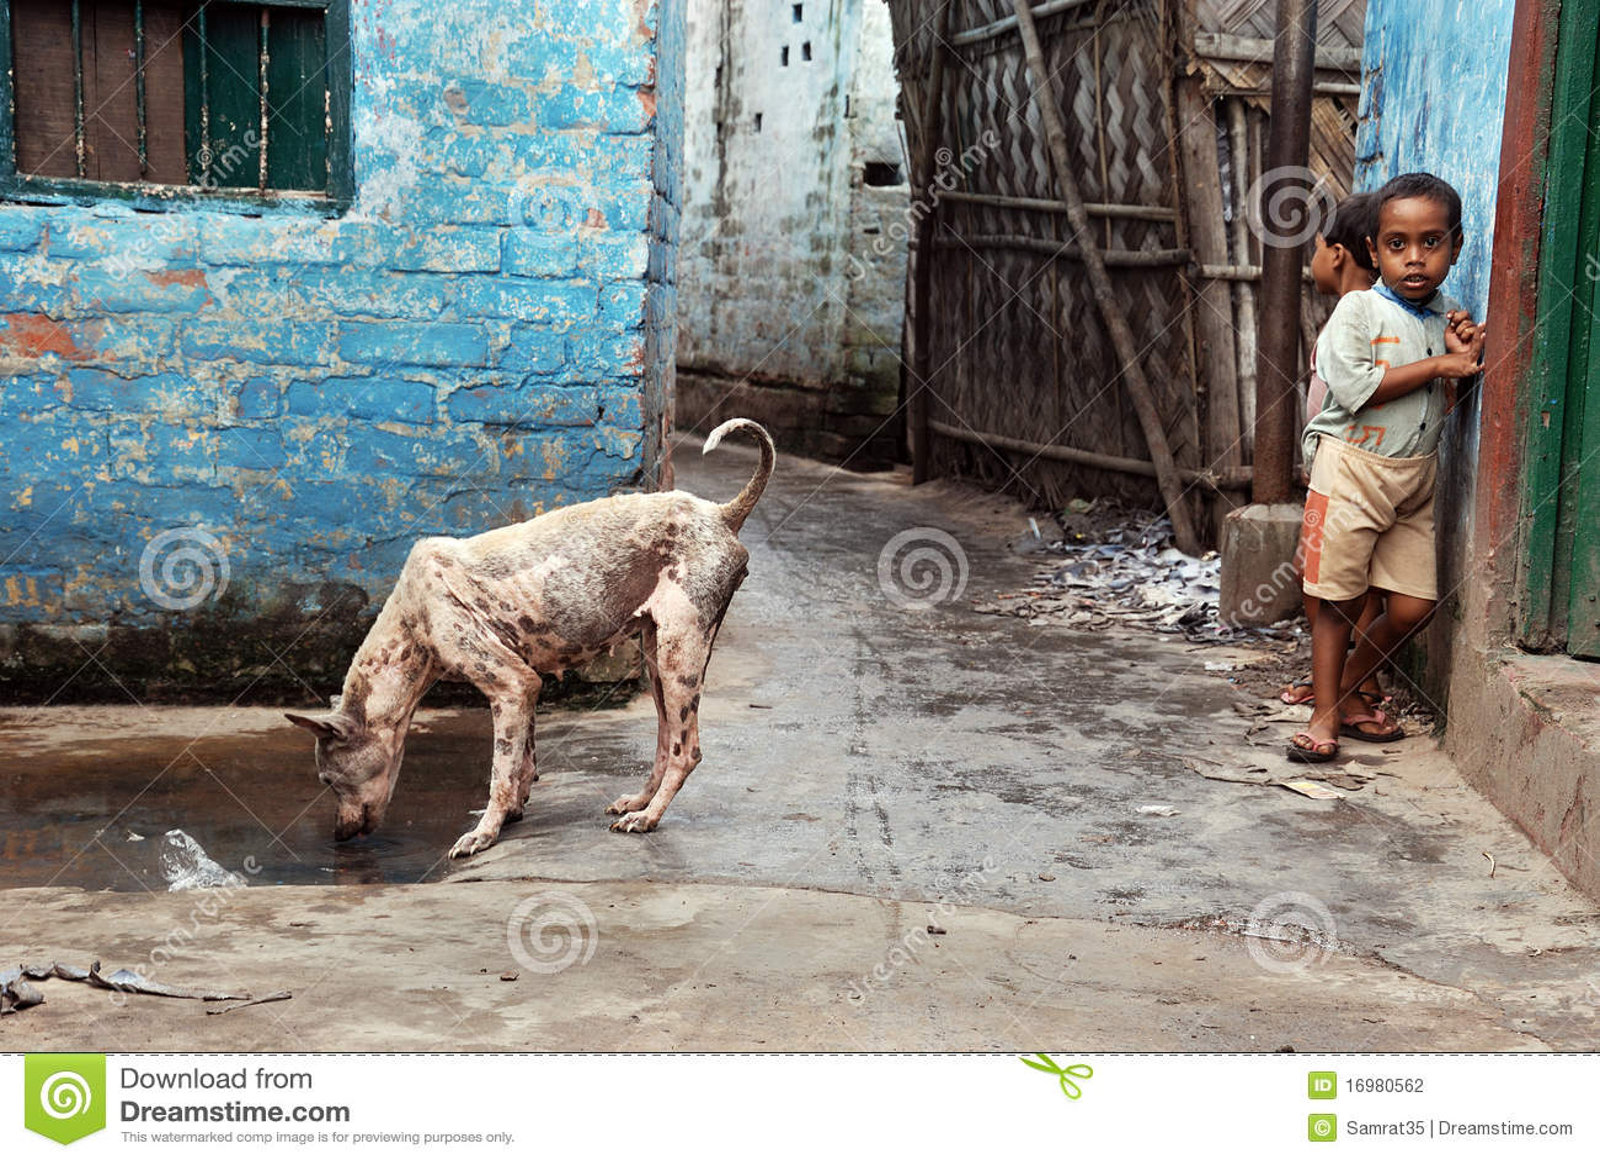 Slum Dwellers Of Kolkata-India Editorial Stock Image